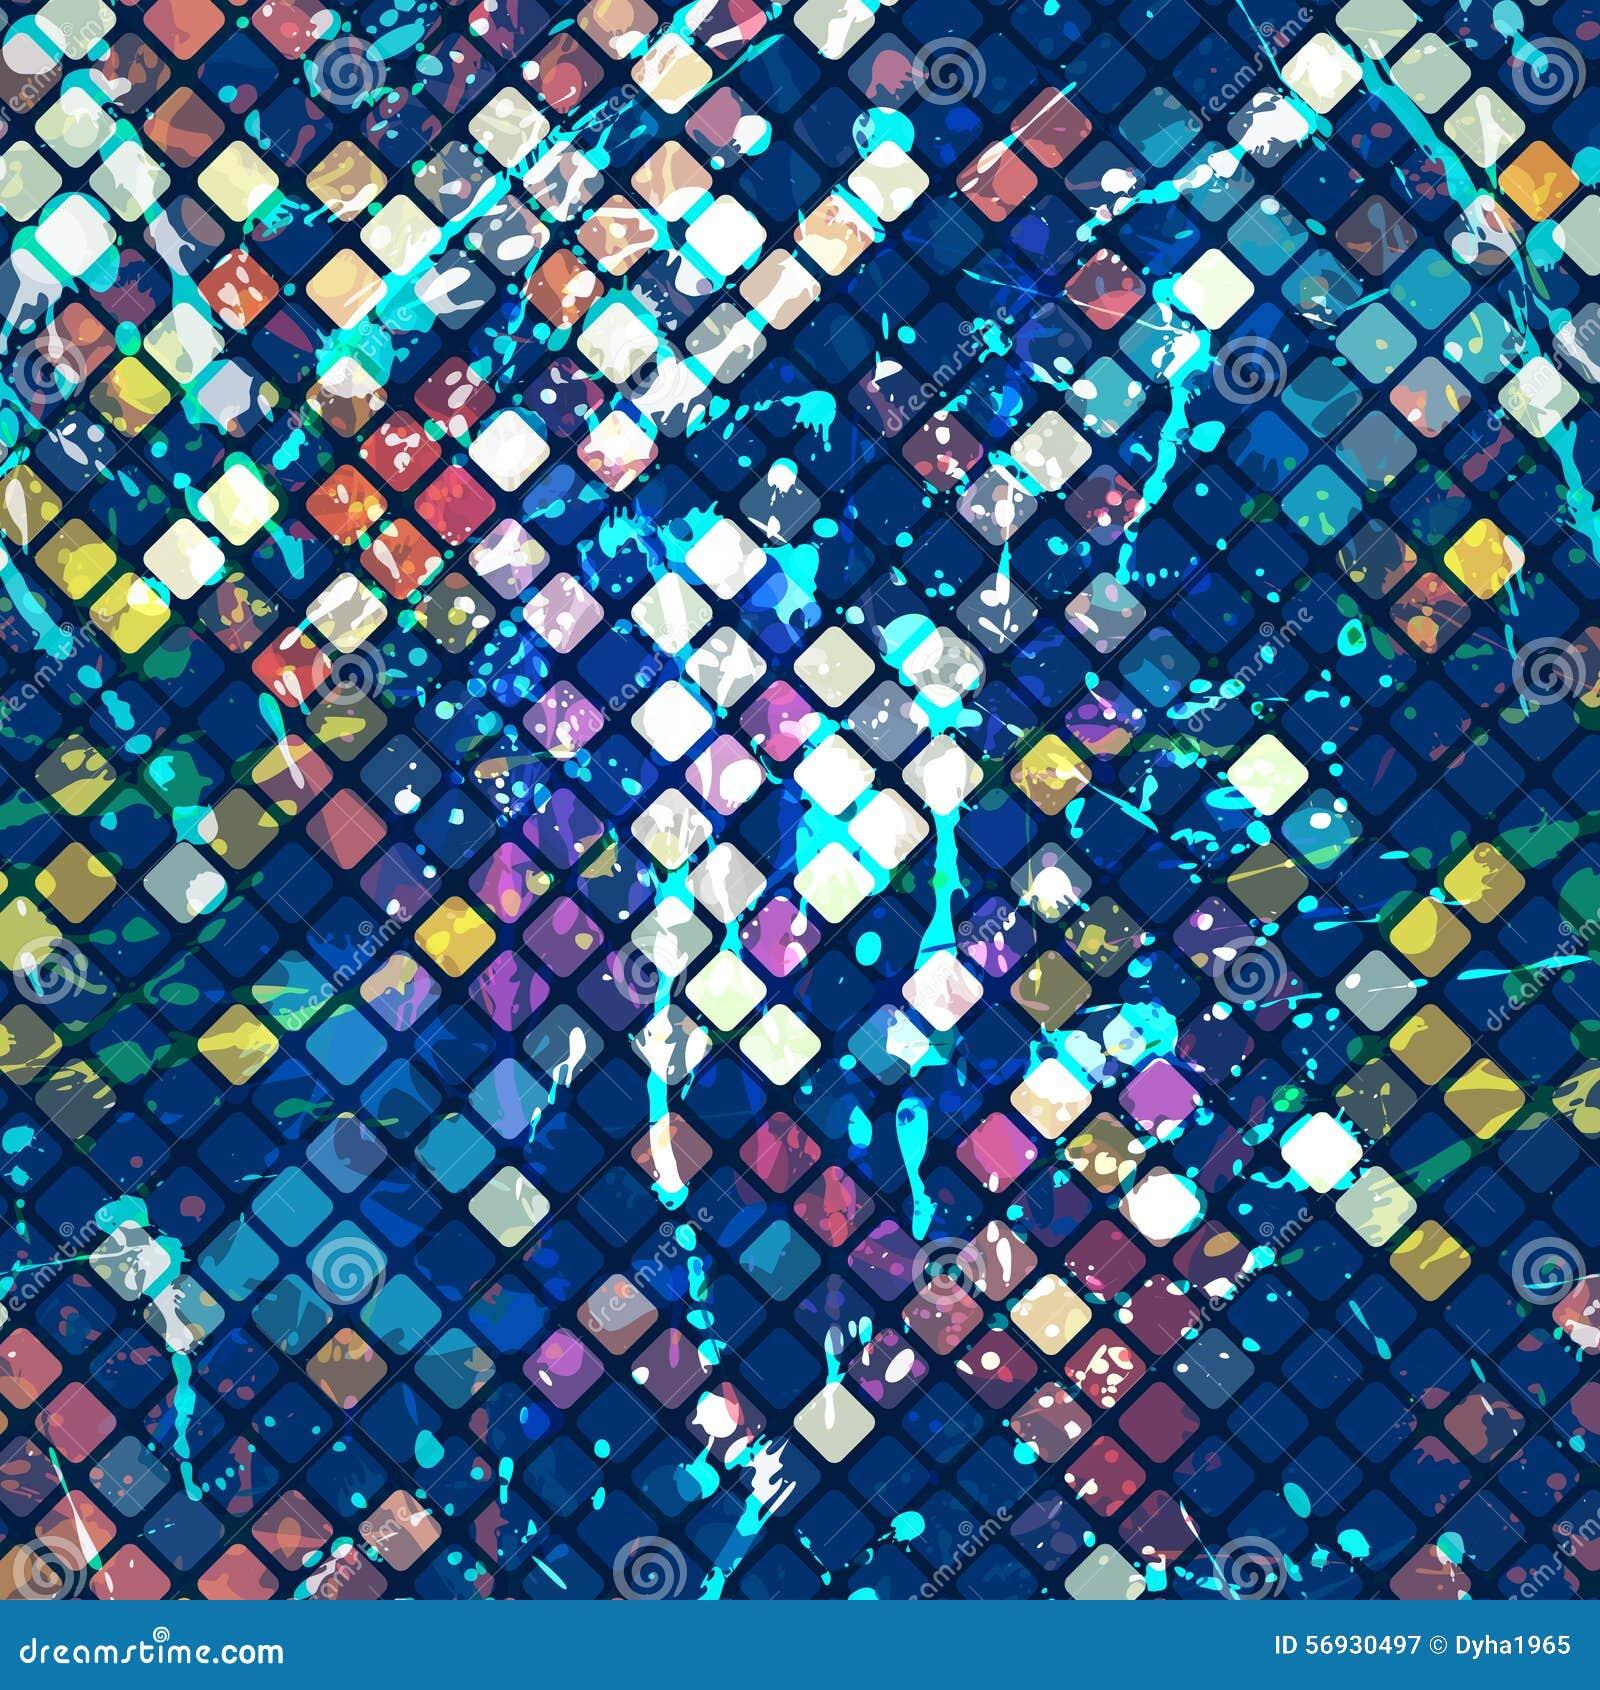 Watercolor Mosaic Stock Vector - Image: 56930497